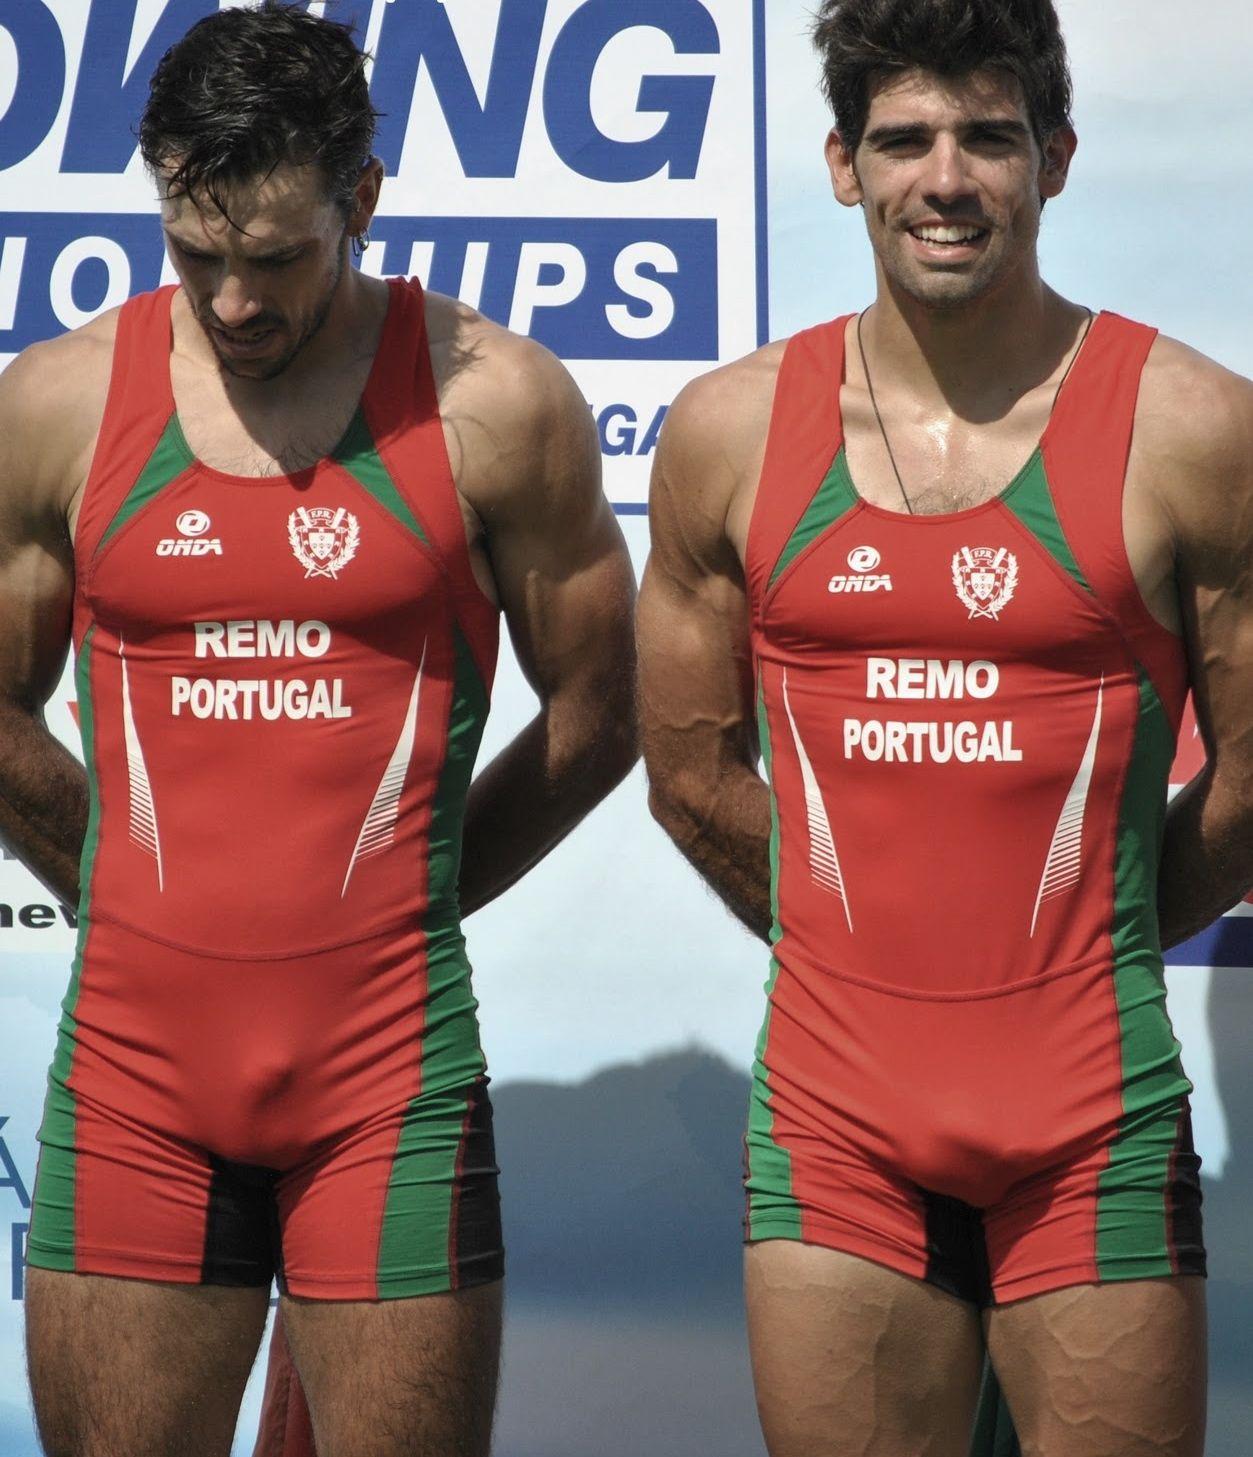 Portugal Rowers  Hot Male Athletes  Imagenes De Deportes -1869